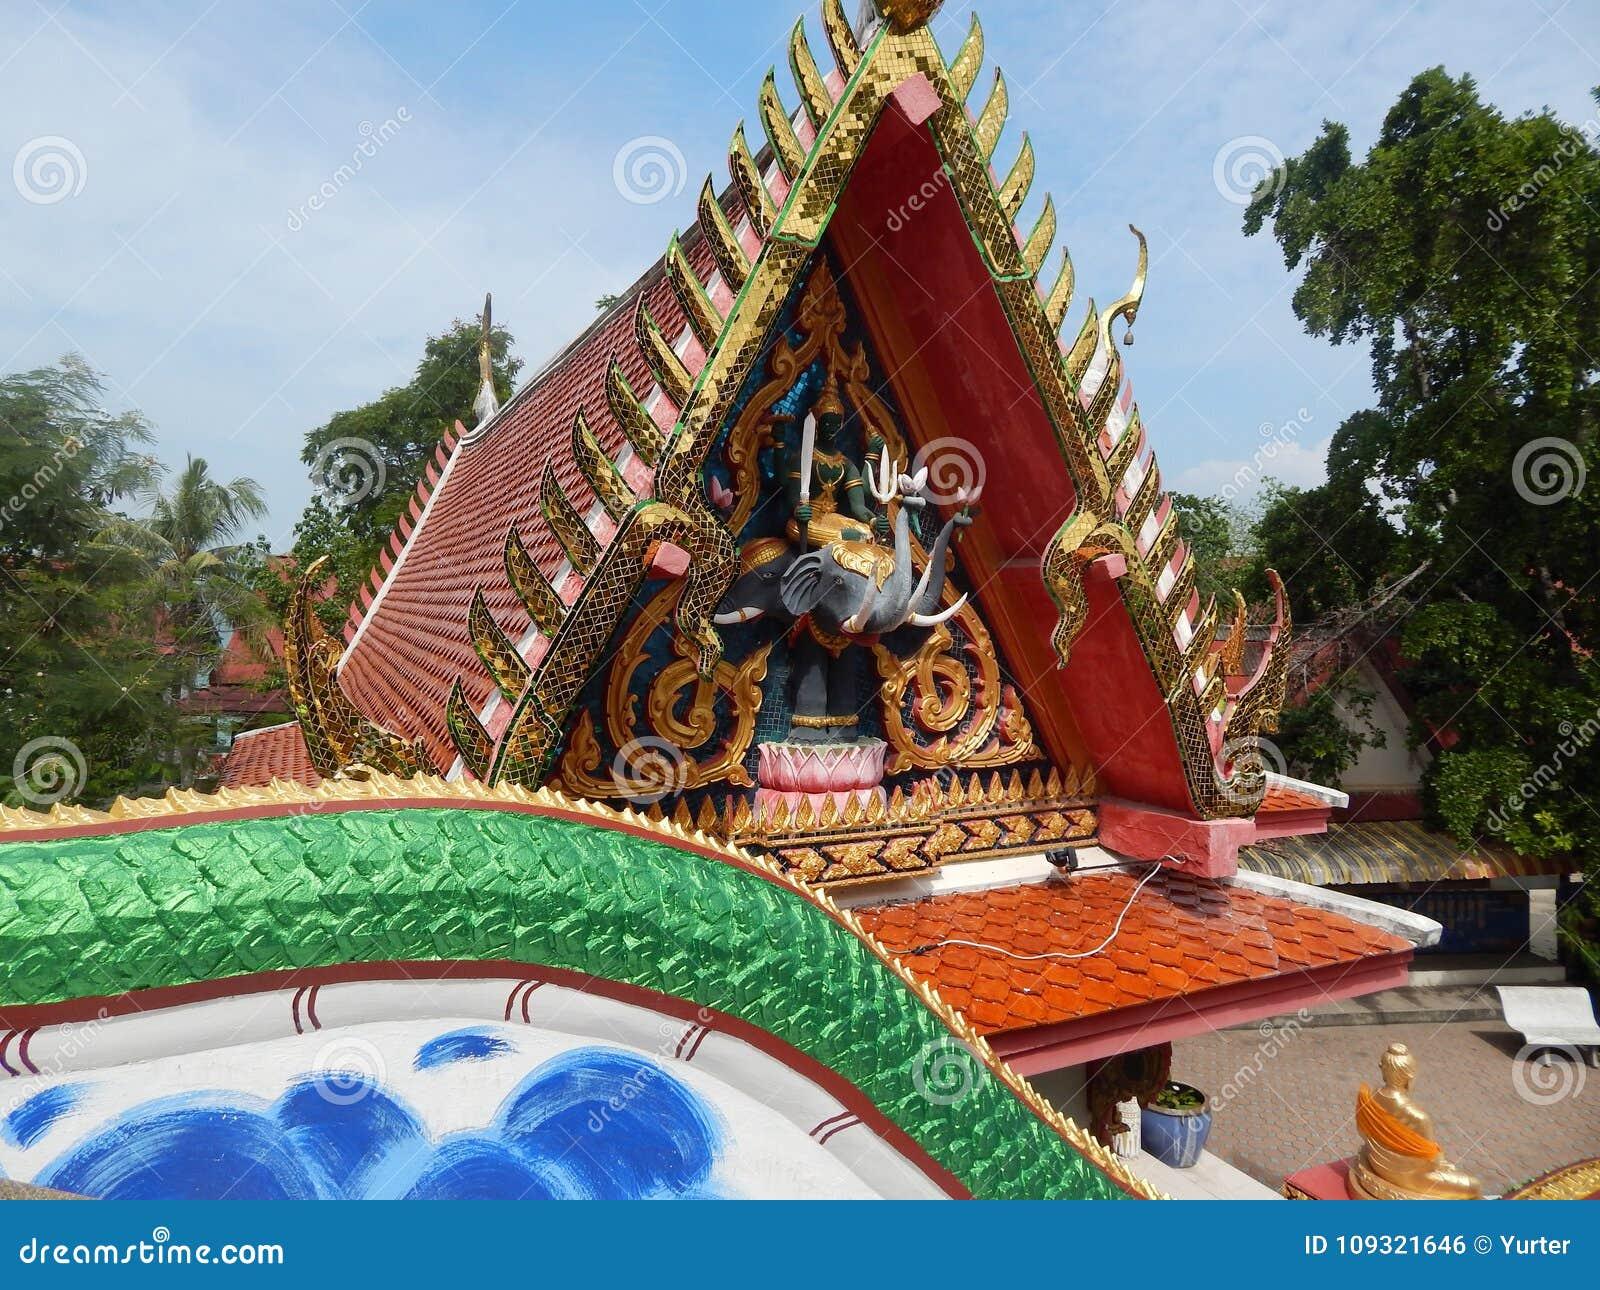 Thailand Samui Island Buddhist Temple Items Of Furniture Stock